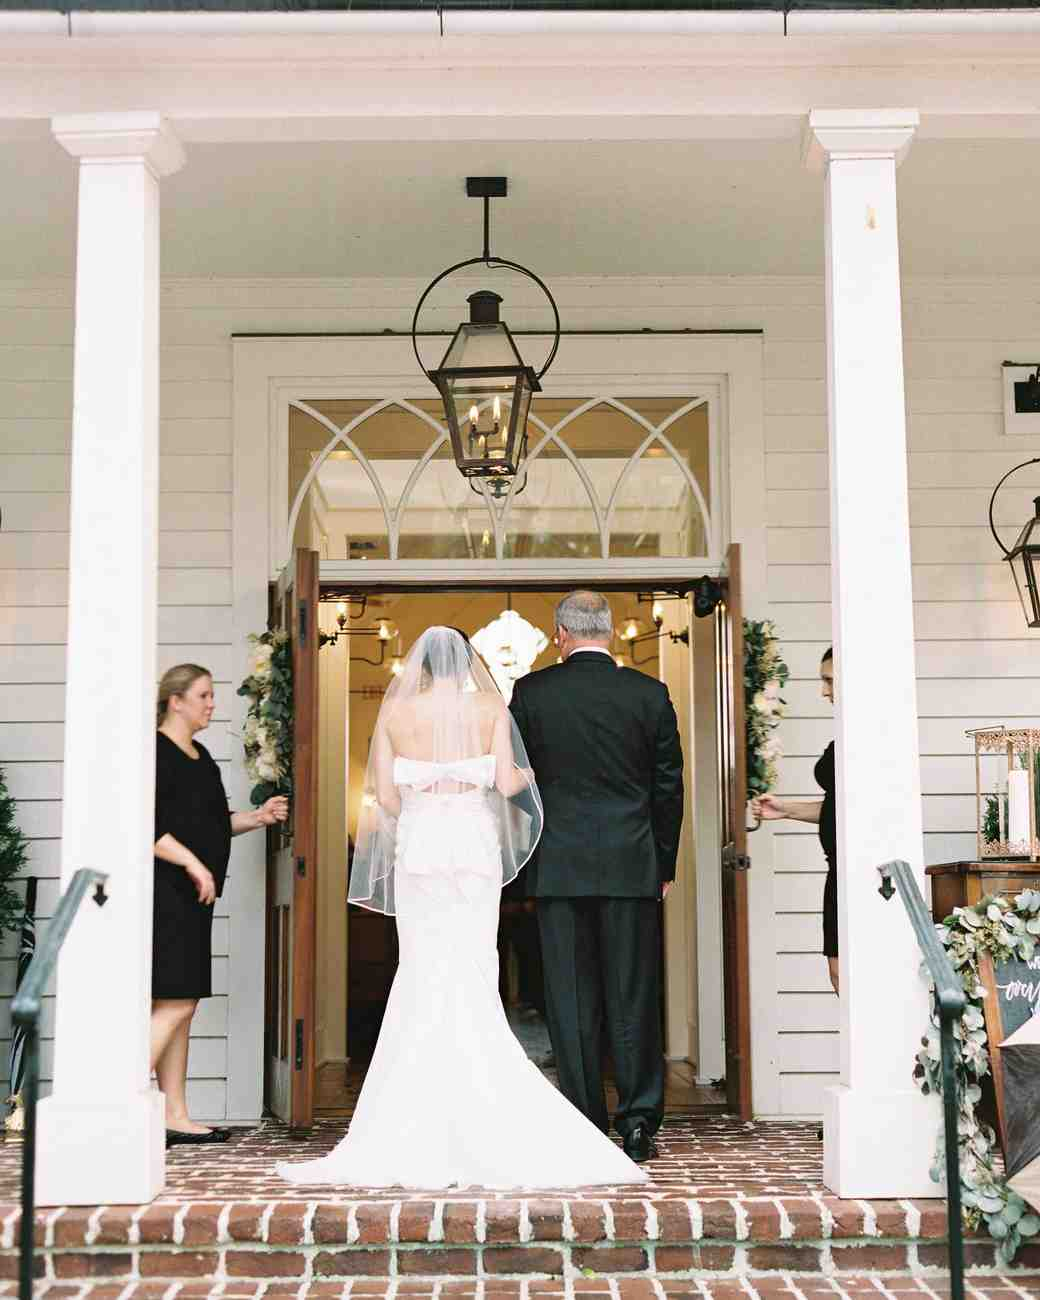 taylor-john-wedding-dad-processional-70-s113035-0616.jpg